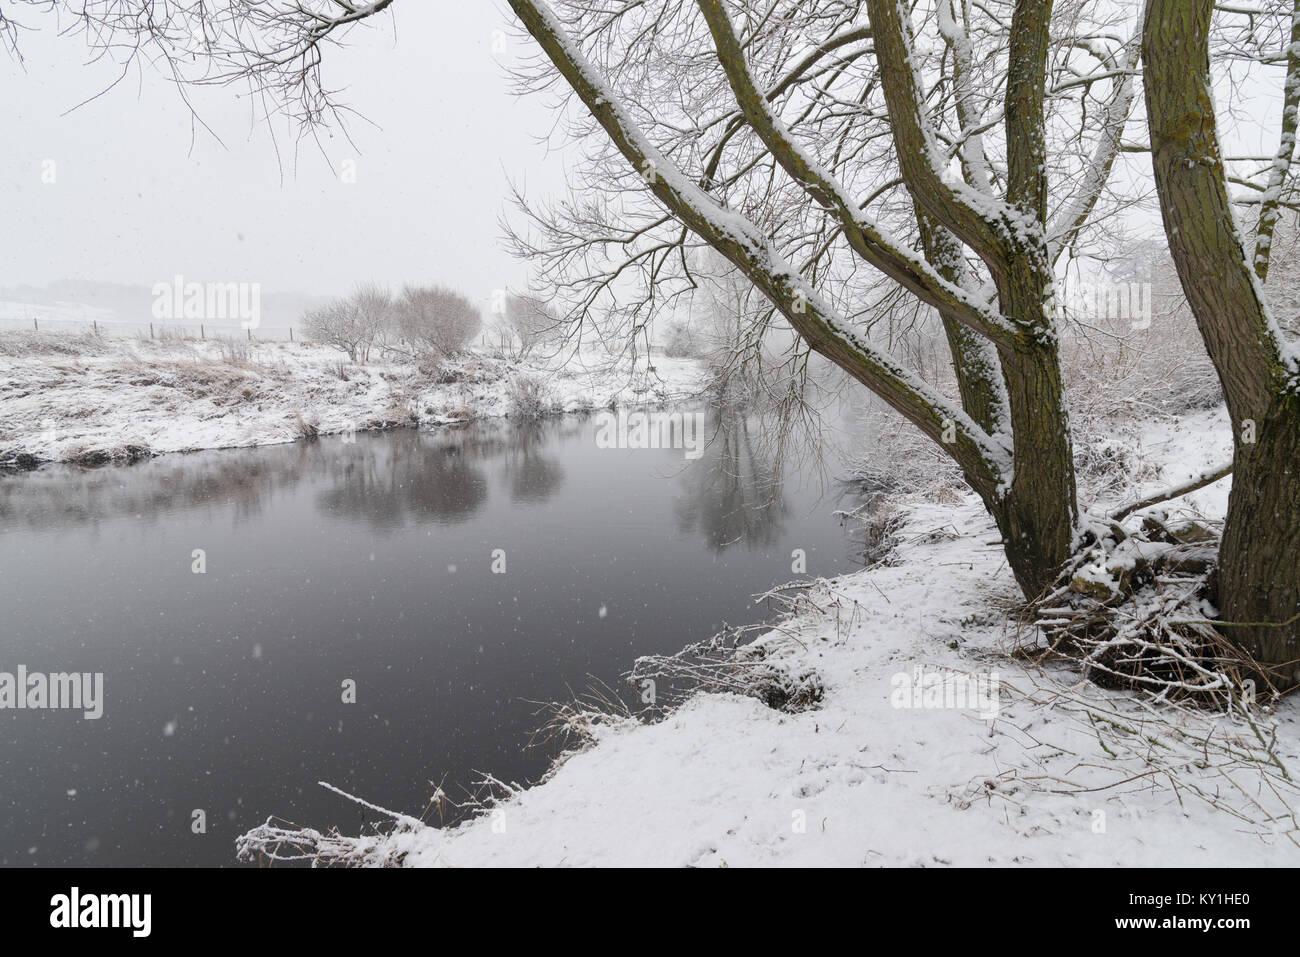 Snowy Durham River, UK - Stock Image